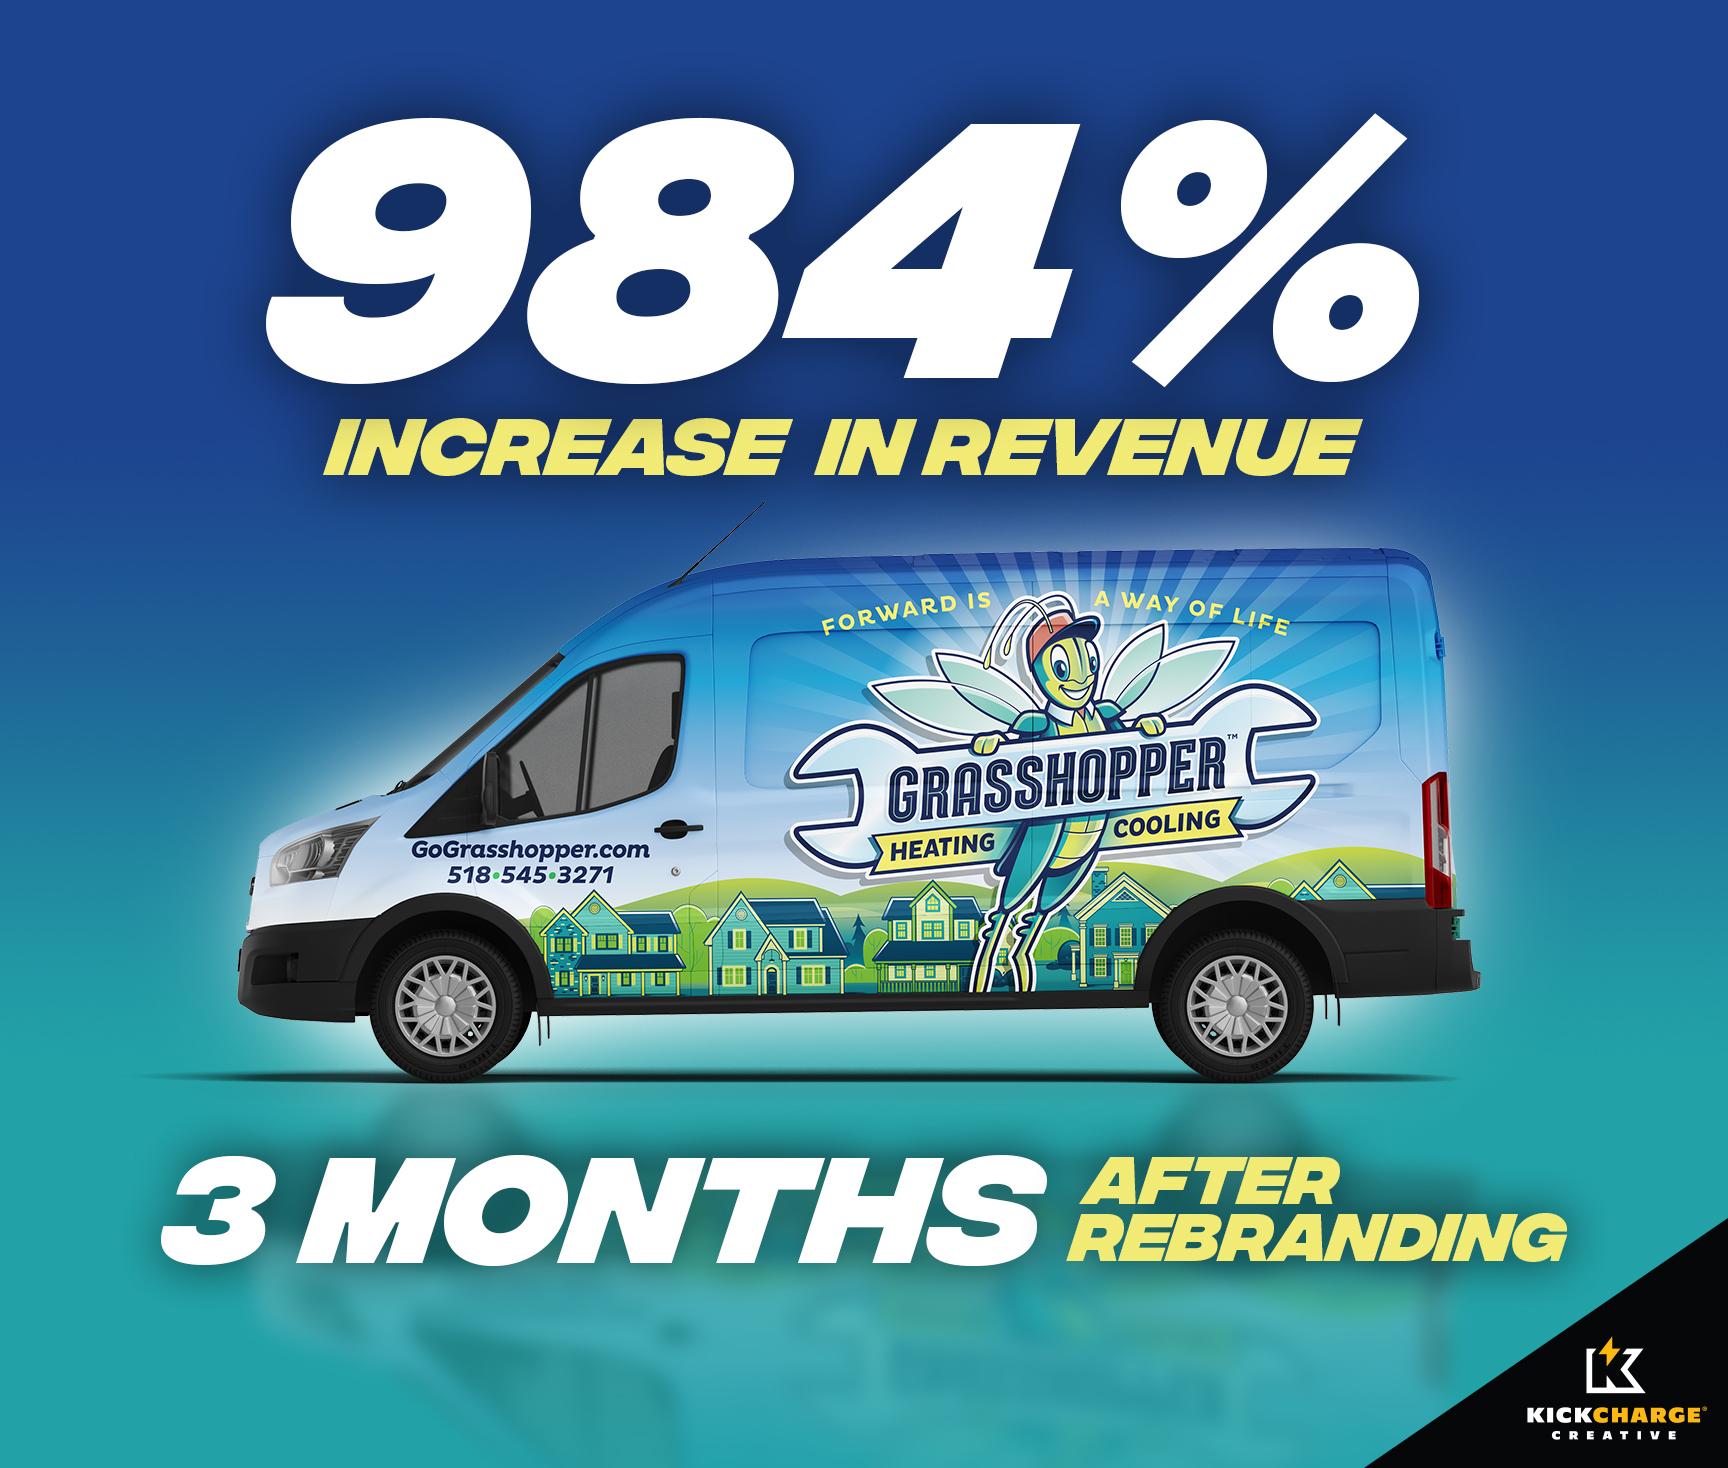 hvac rebranding success, hvac truck wrap